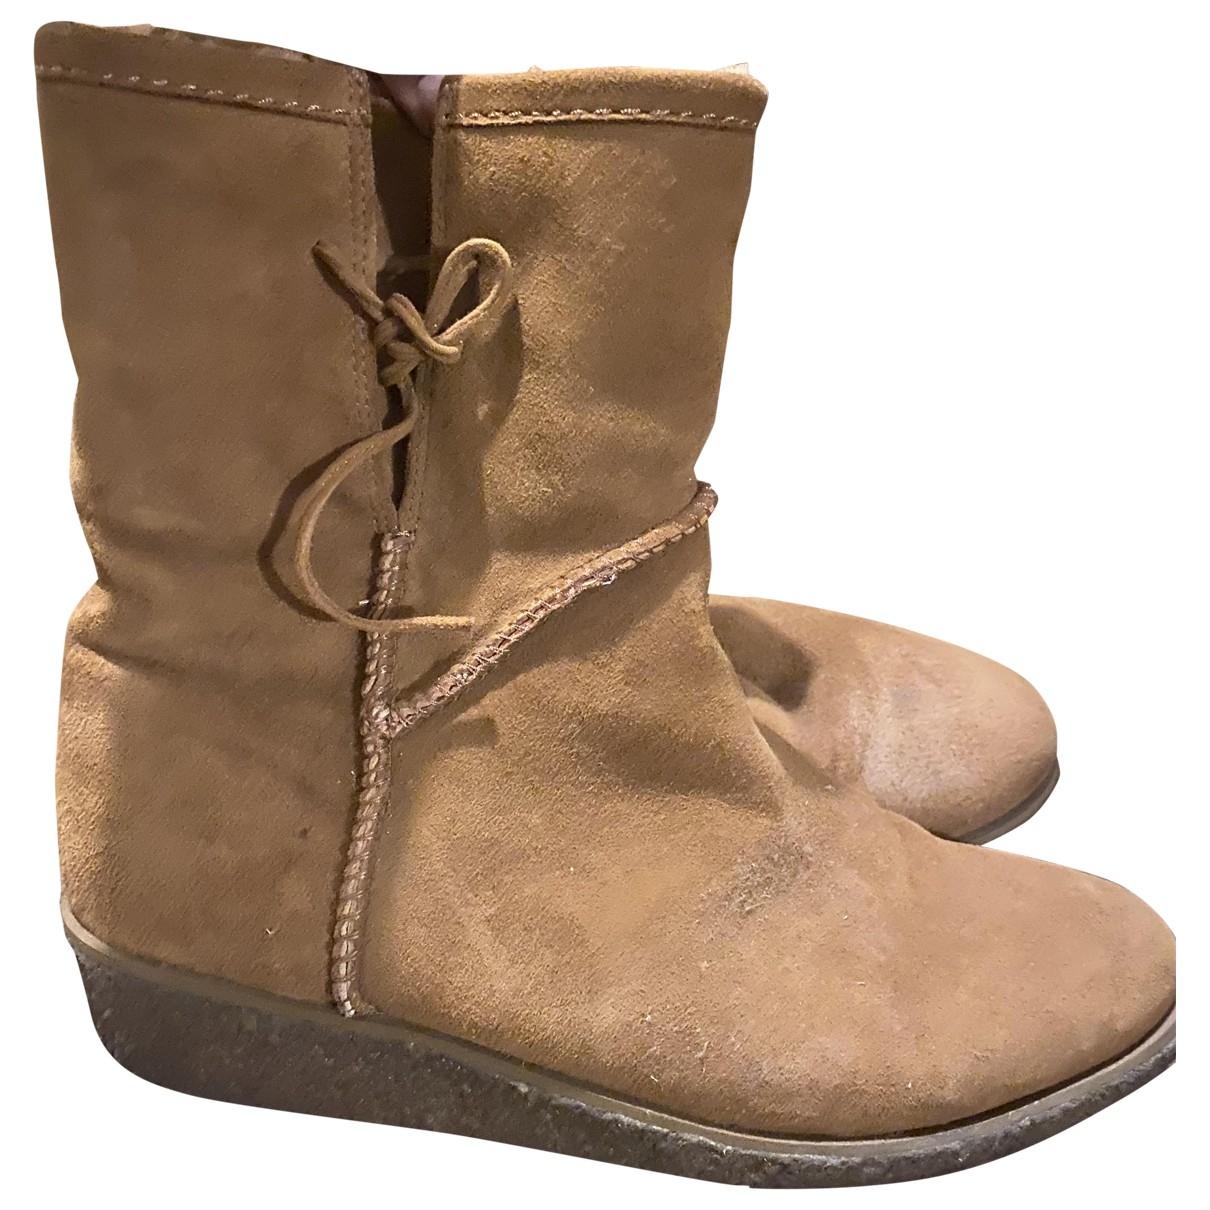 Lk Bennett \N Camel Suede Boots for Women 7 UK